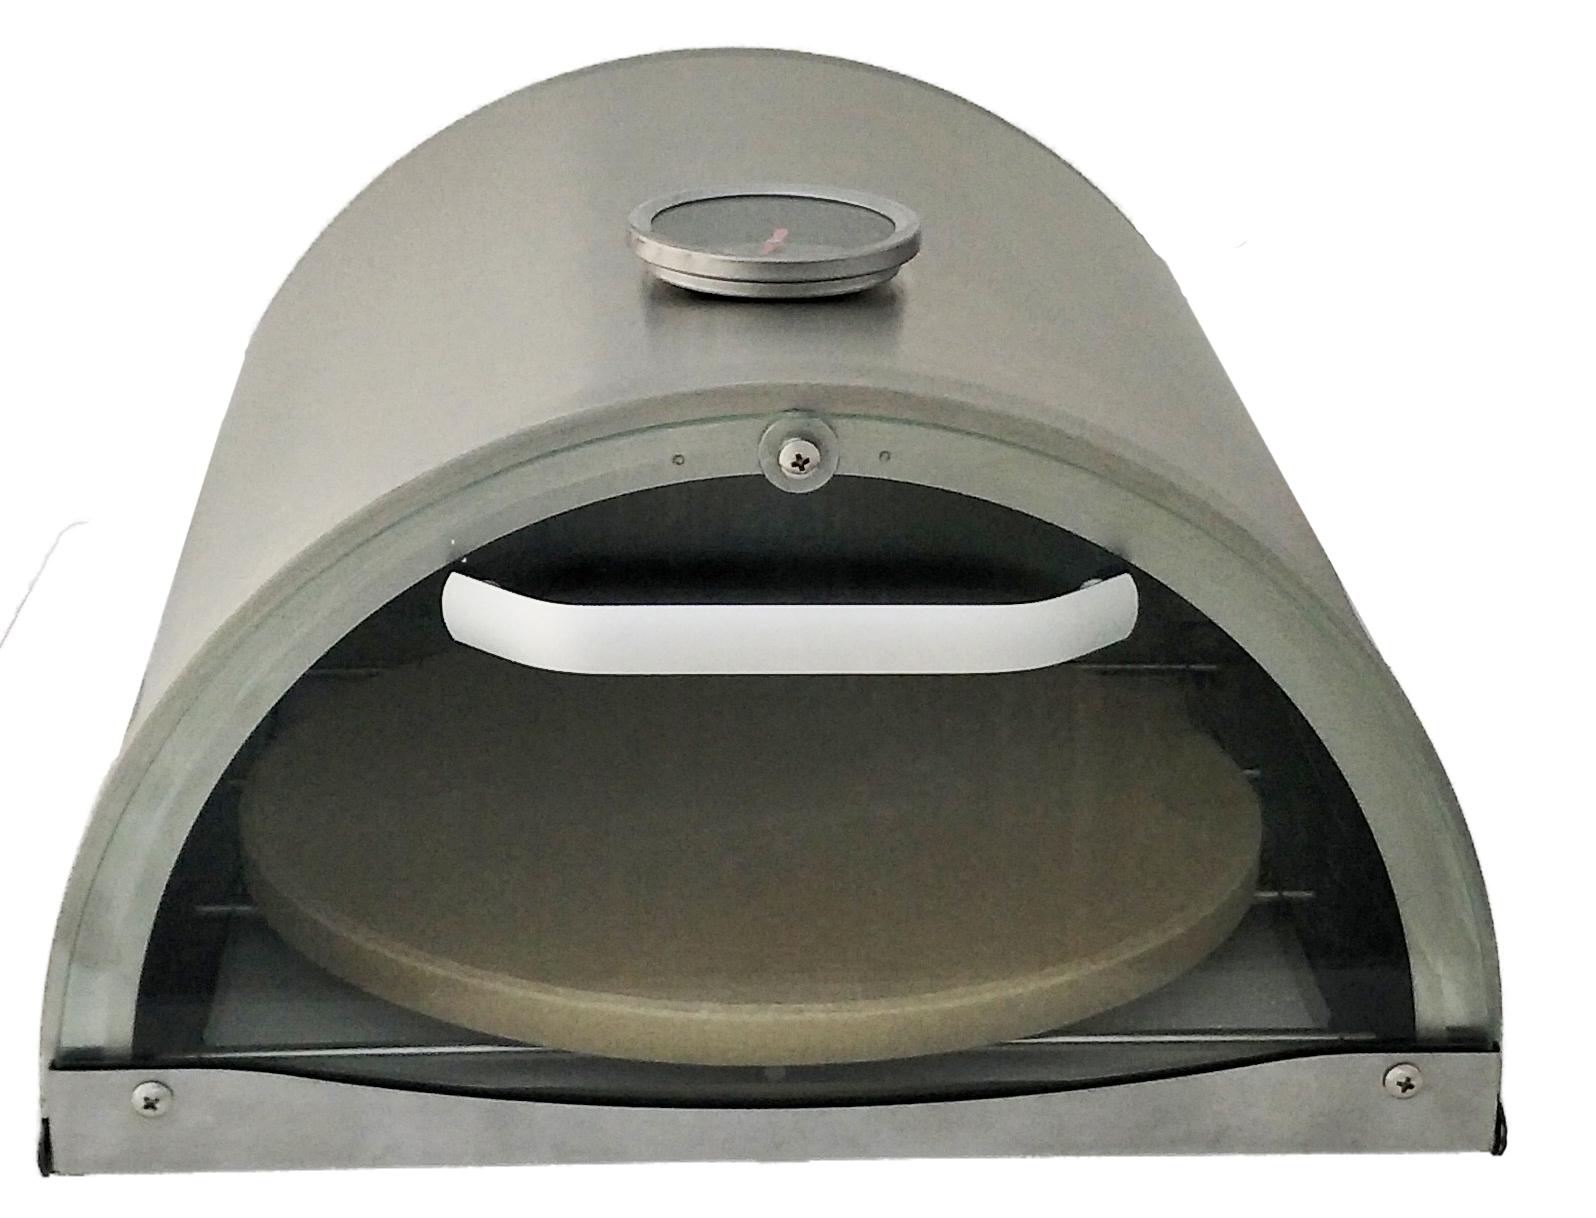 Pizza box 2 JPEG.jpg